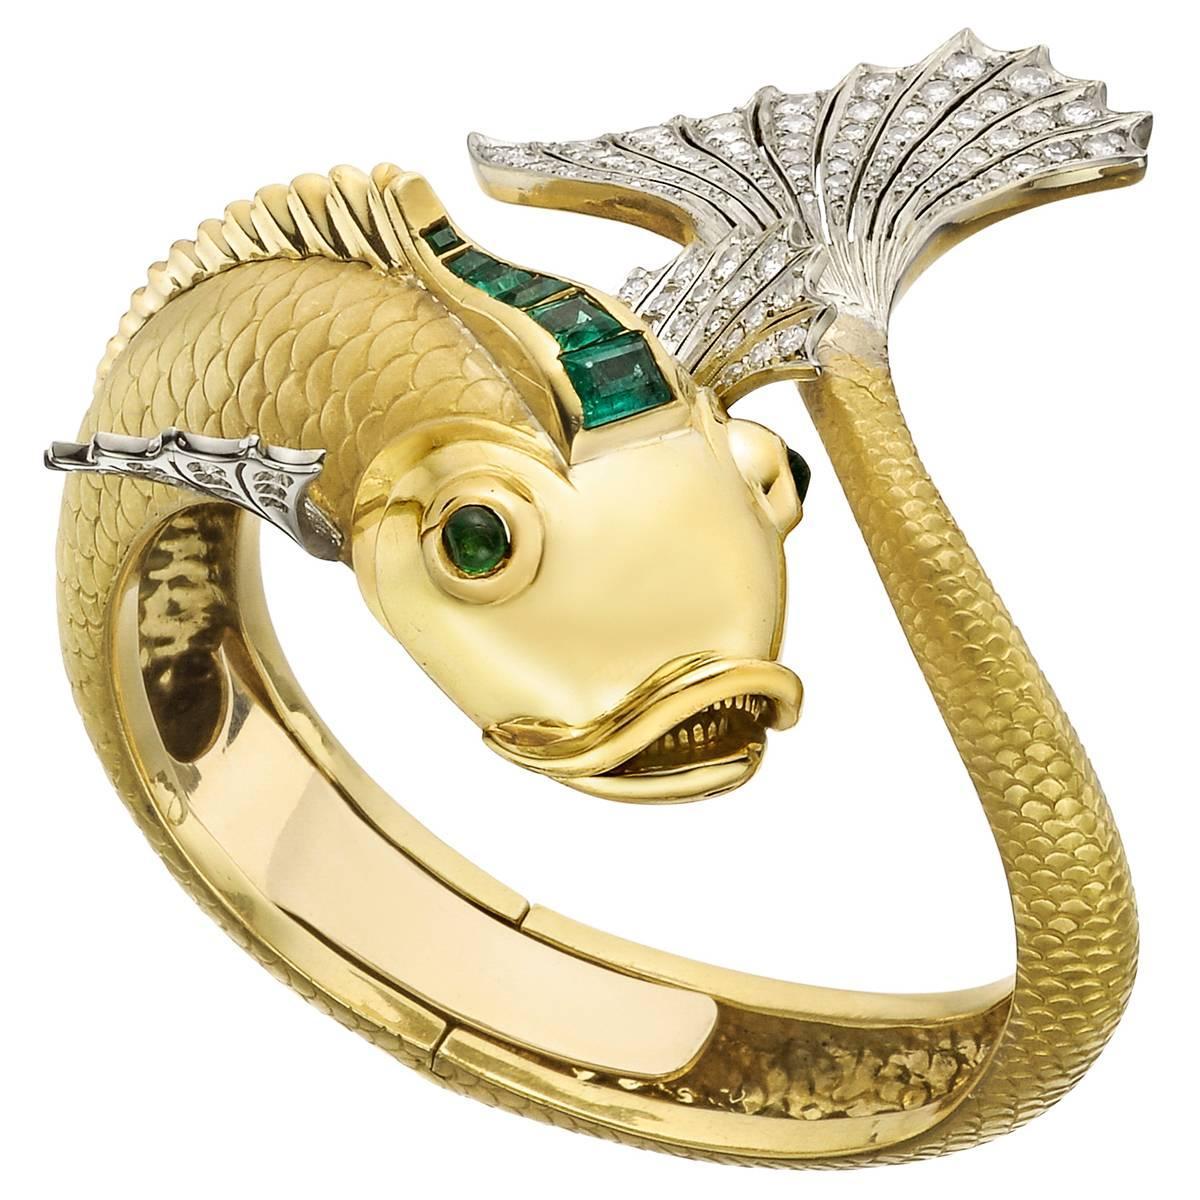 Emerald Diamond Gold Koi Fish Cuff Bracelet For Sale at 1stdibs